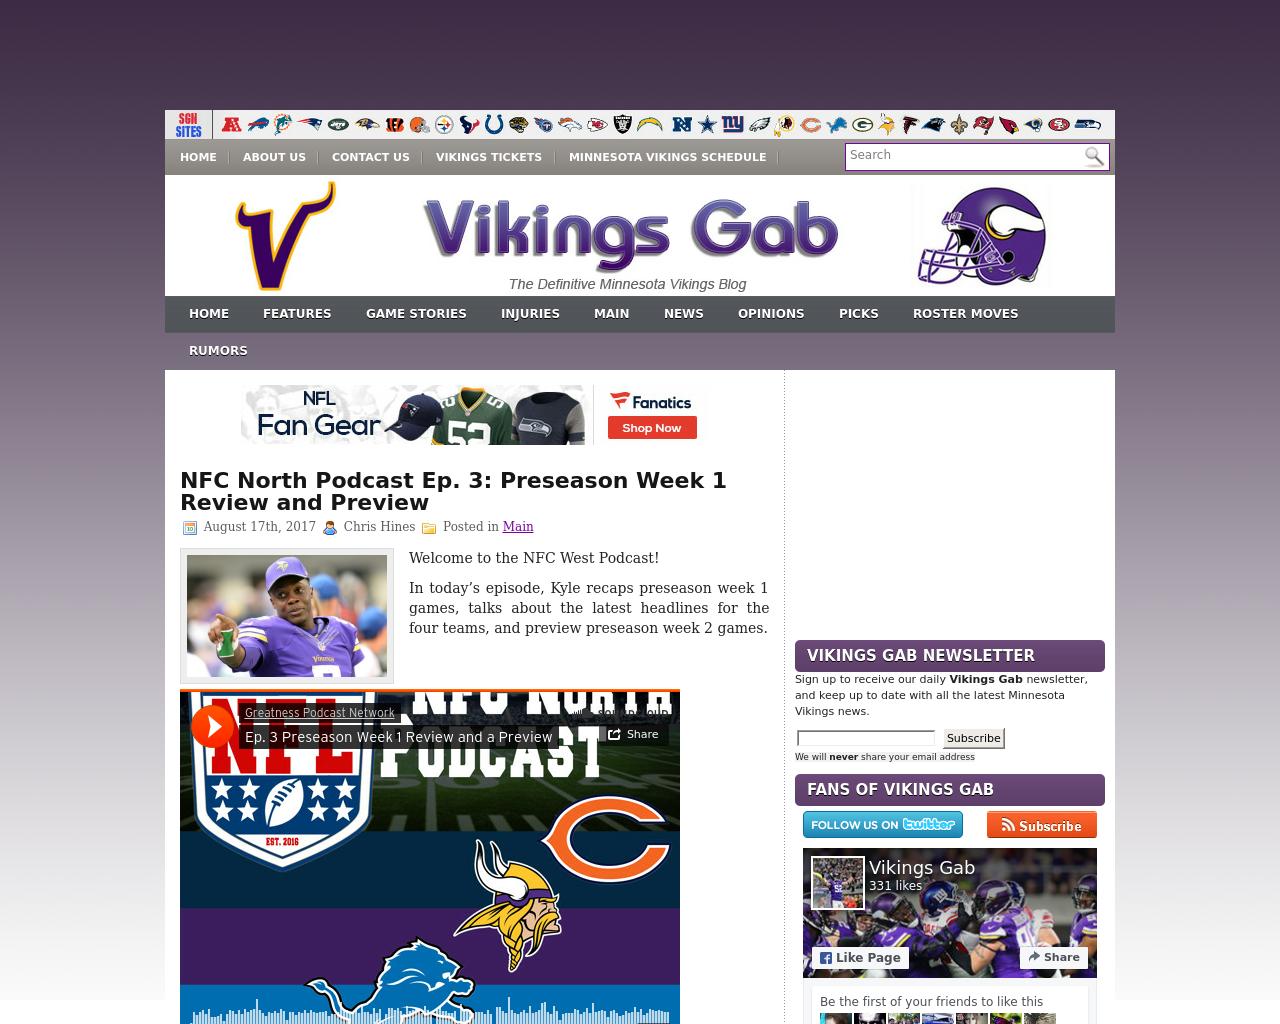 Vikings-Gab-Advertising-Reviews-Pricing